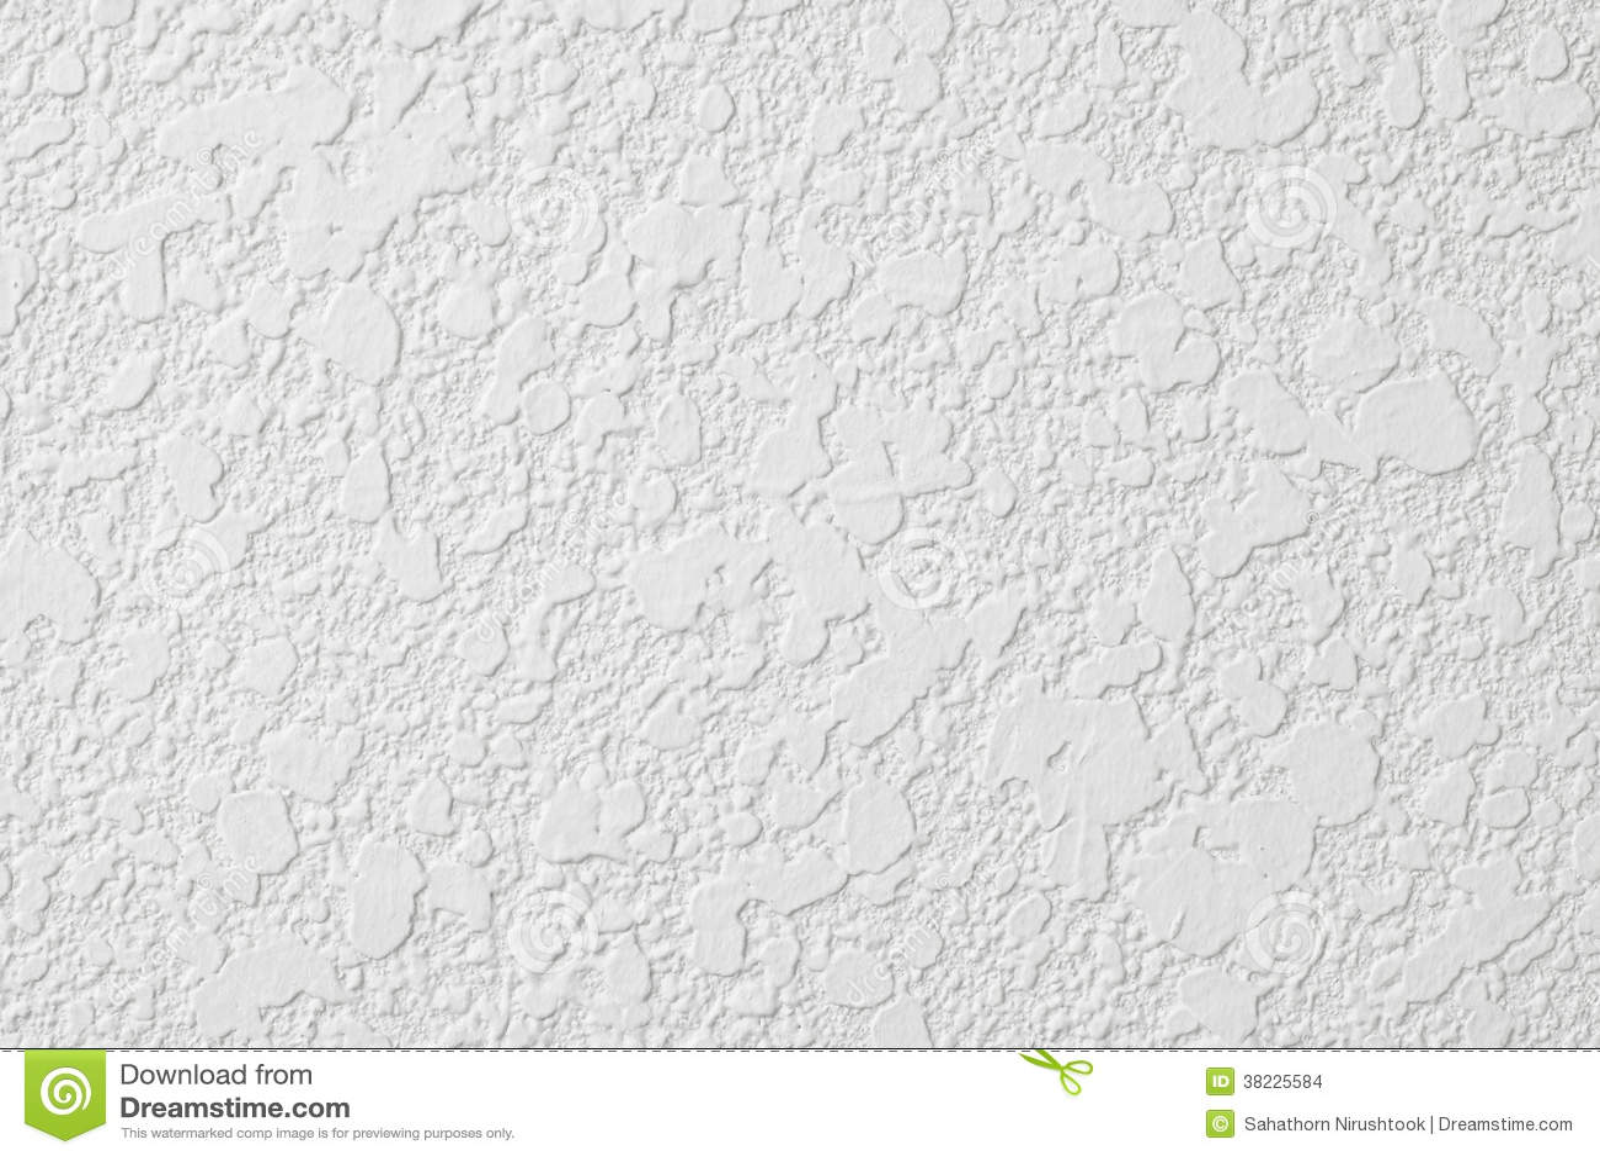 Textura blanca moderna de la pared usando como fondo imagenes de archivo imagen 38225584 - Textura pared ...